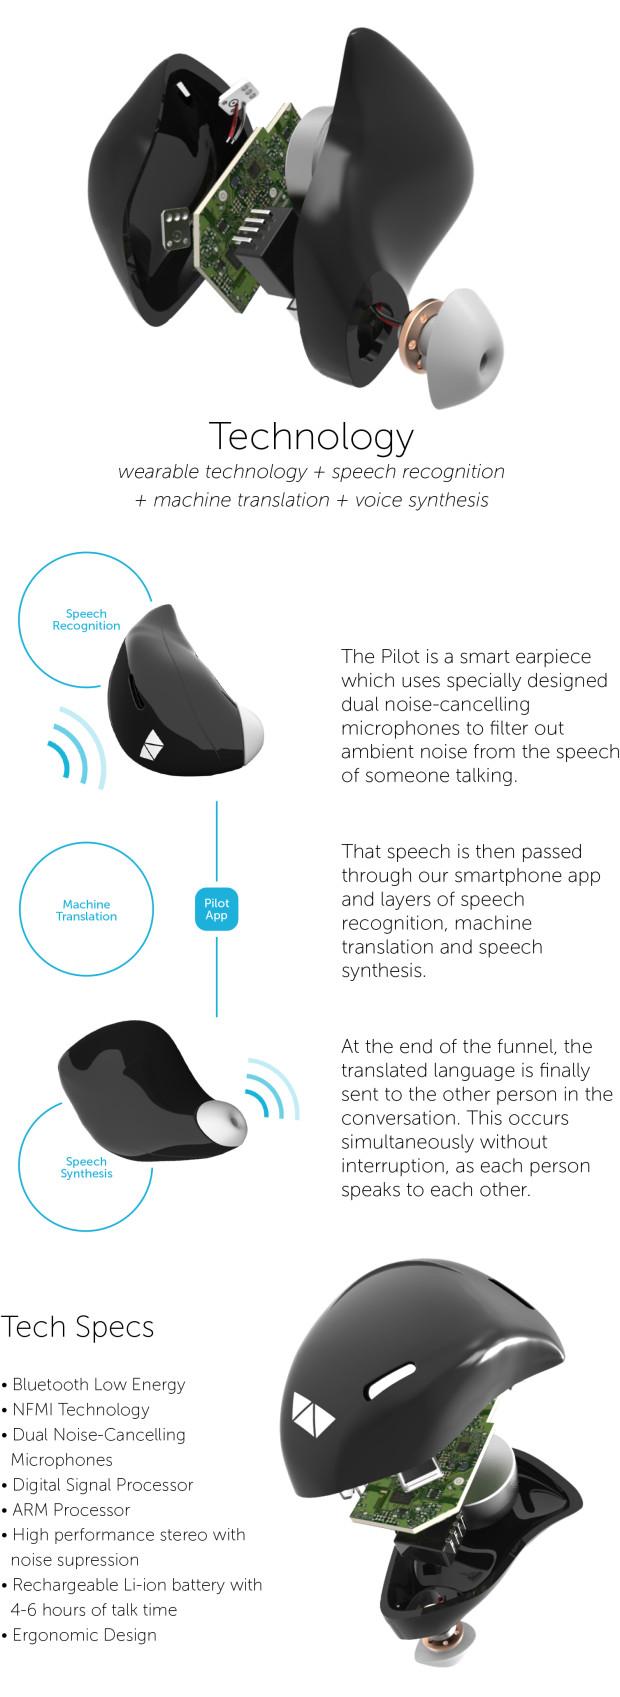 Pilot tecnologia associada Pedro Topete Apple Blog Portugal tradutor